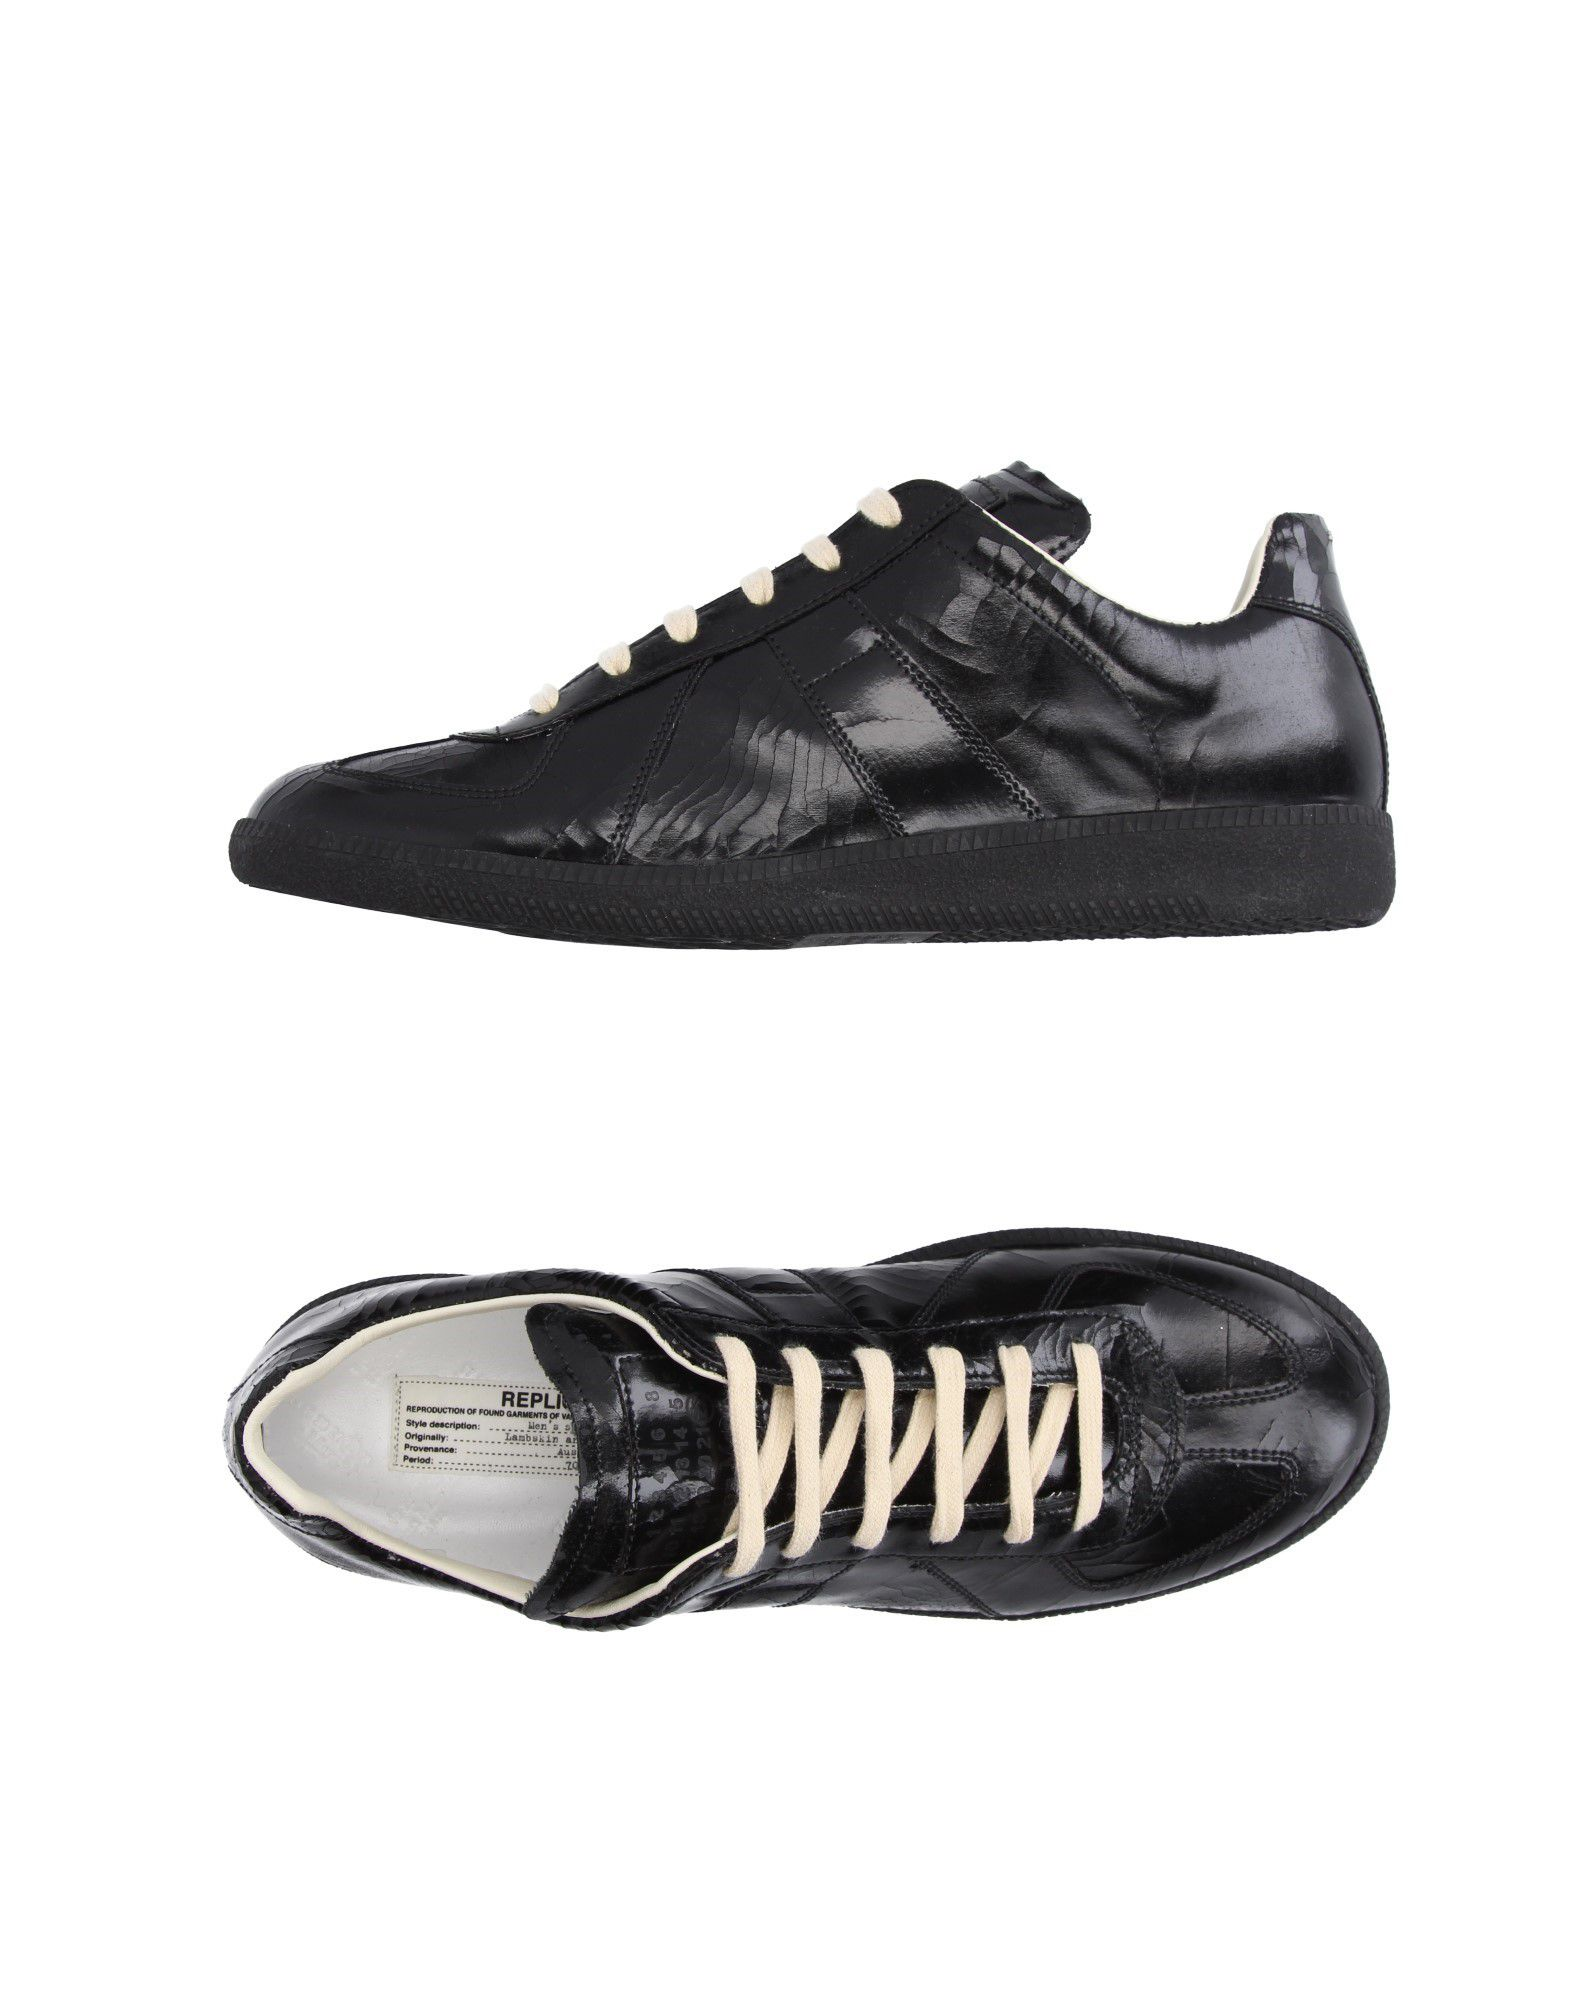 Maison 11217872EA Margiela Sneakers Herren  11217872EA Maison Gute Qualität beliebte Schuhe d9daf8